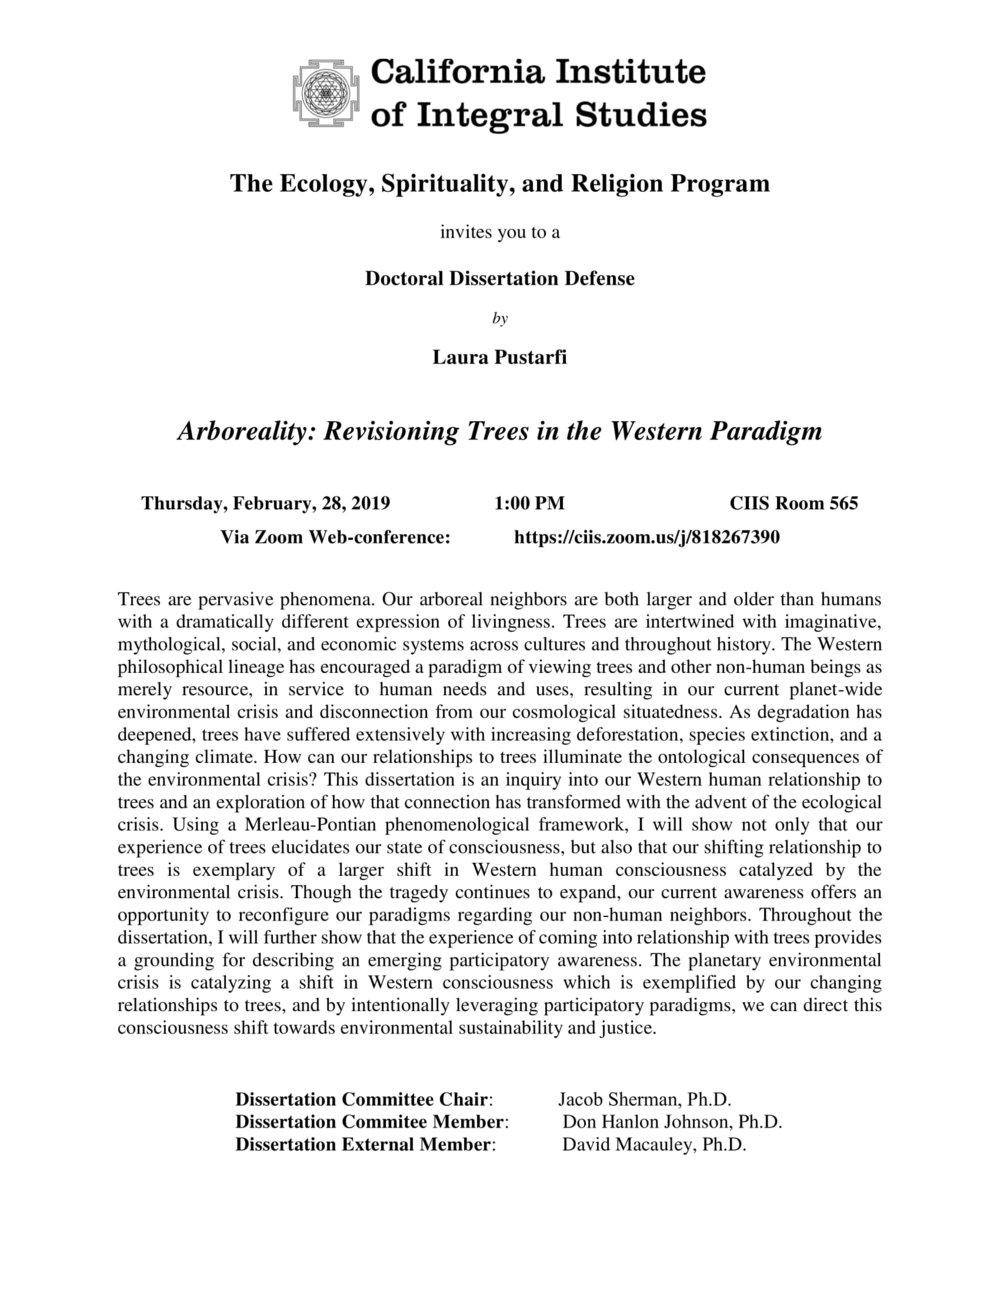 Dissertation Announcement_Pustarfi-1.jpg